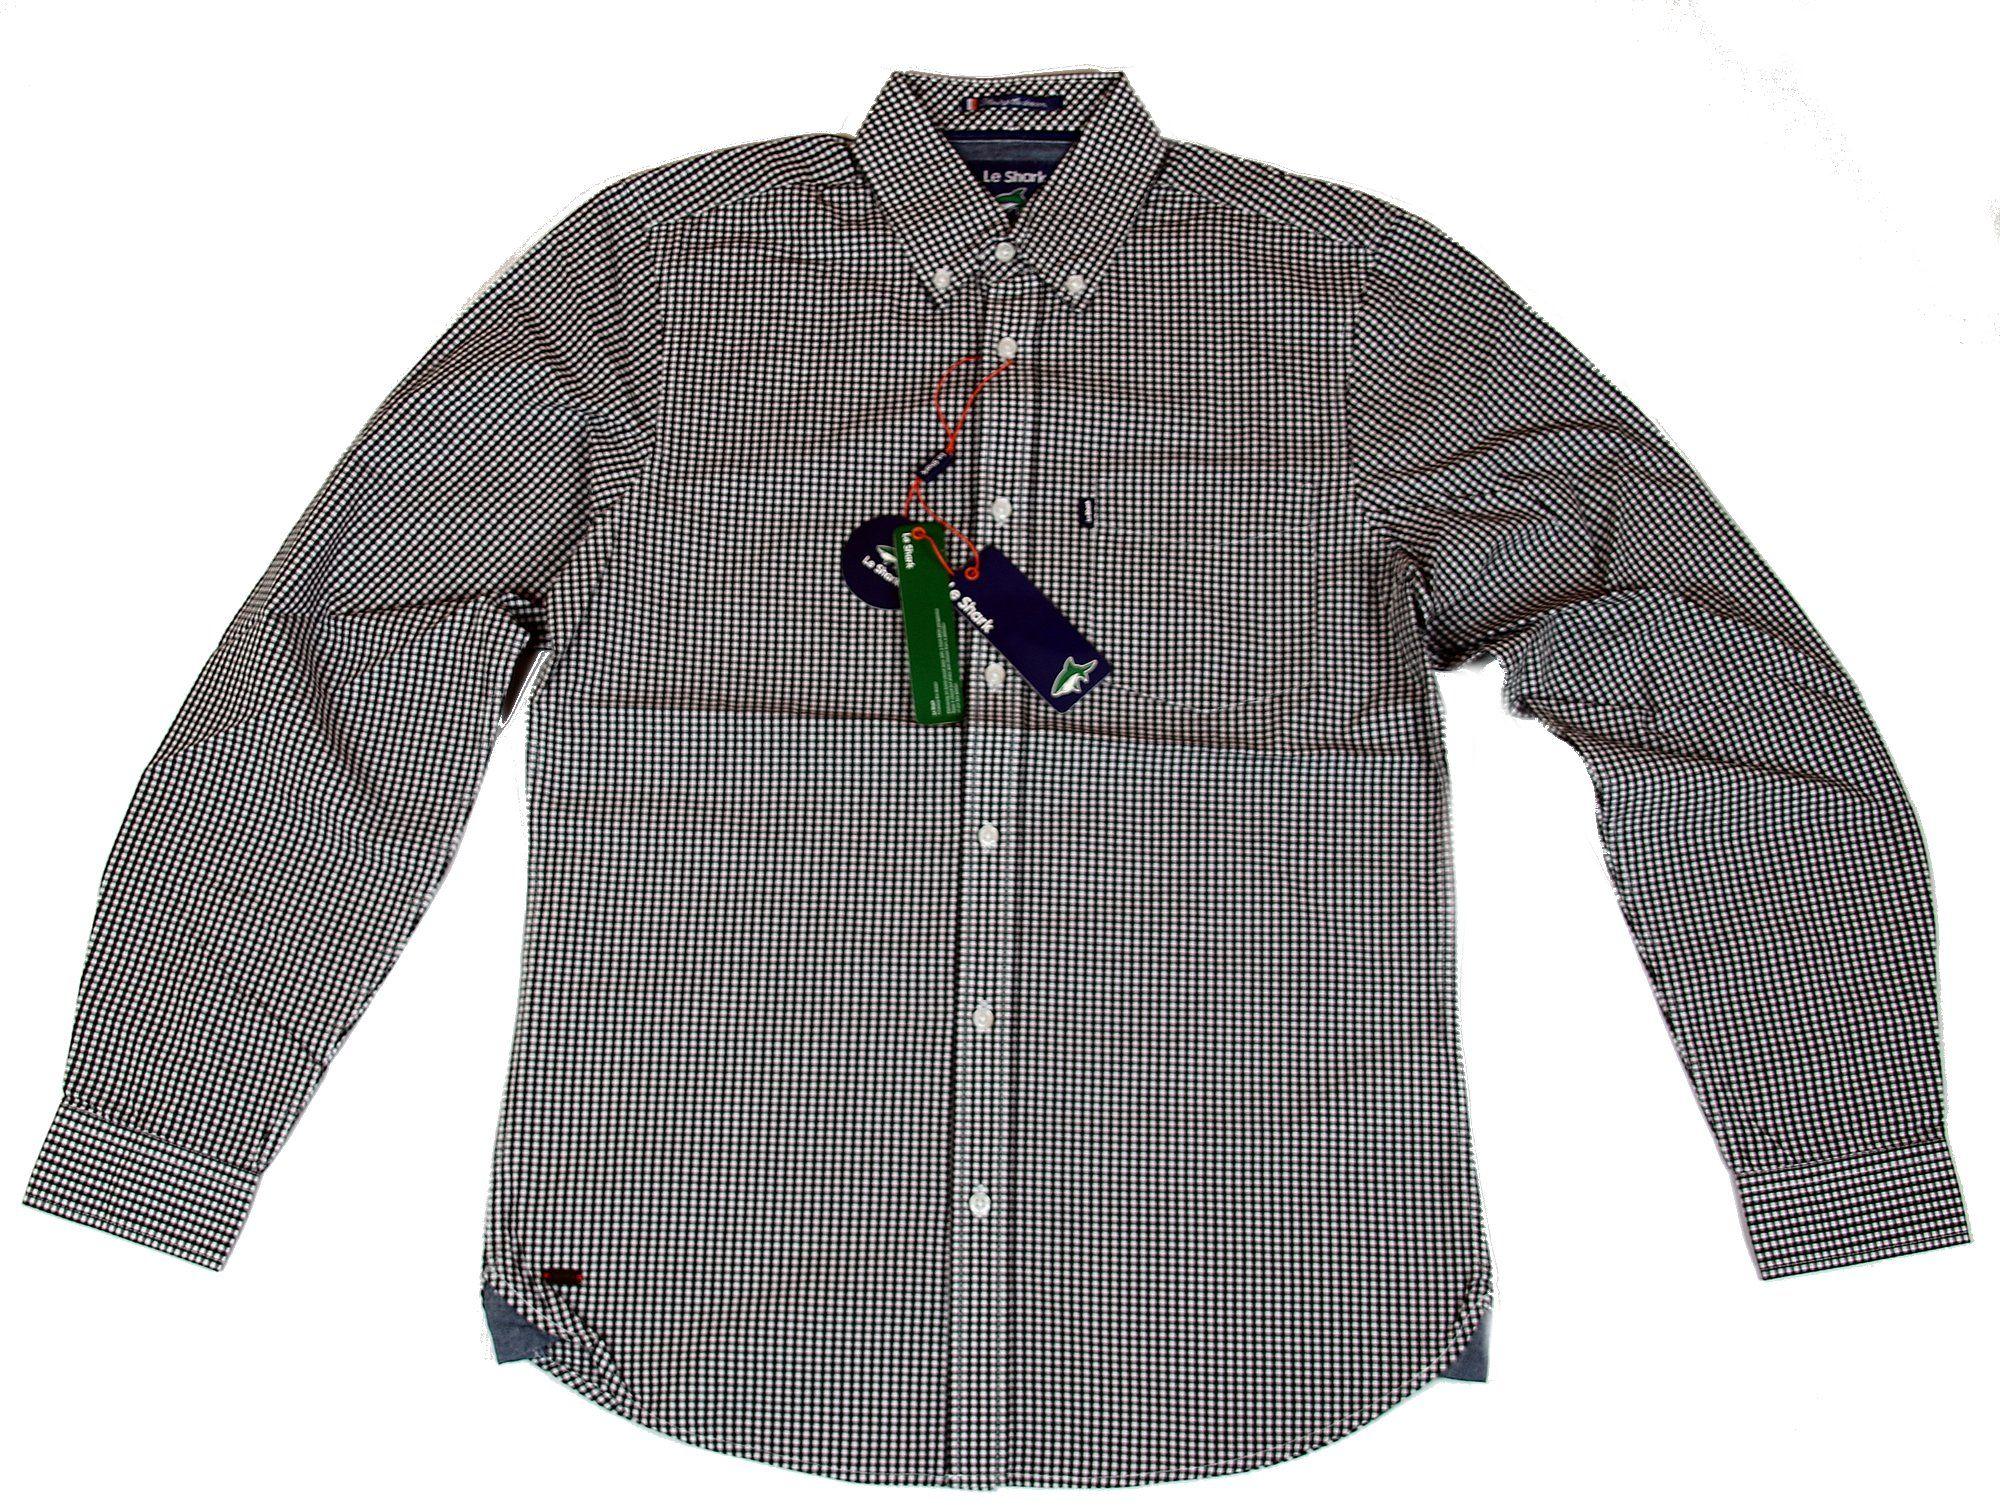 Koszula Meska W Krate Koszula Sportowa Krata S Mens Tops Shirts Shirt Dress